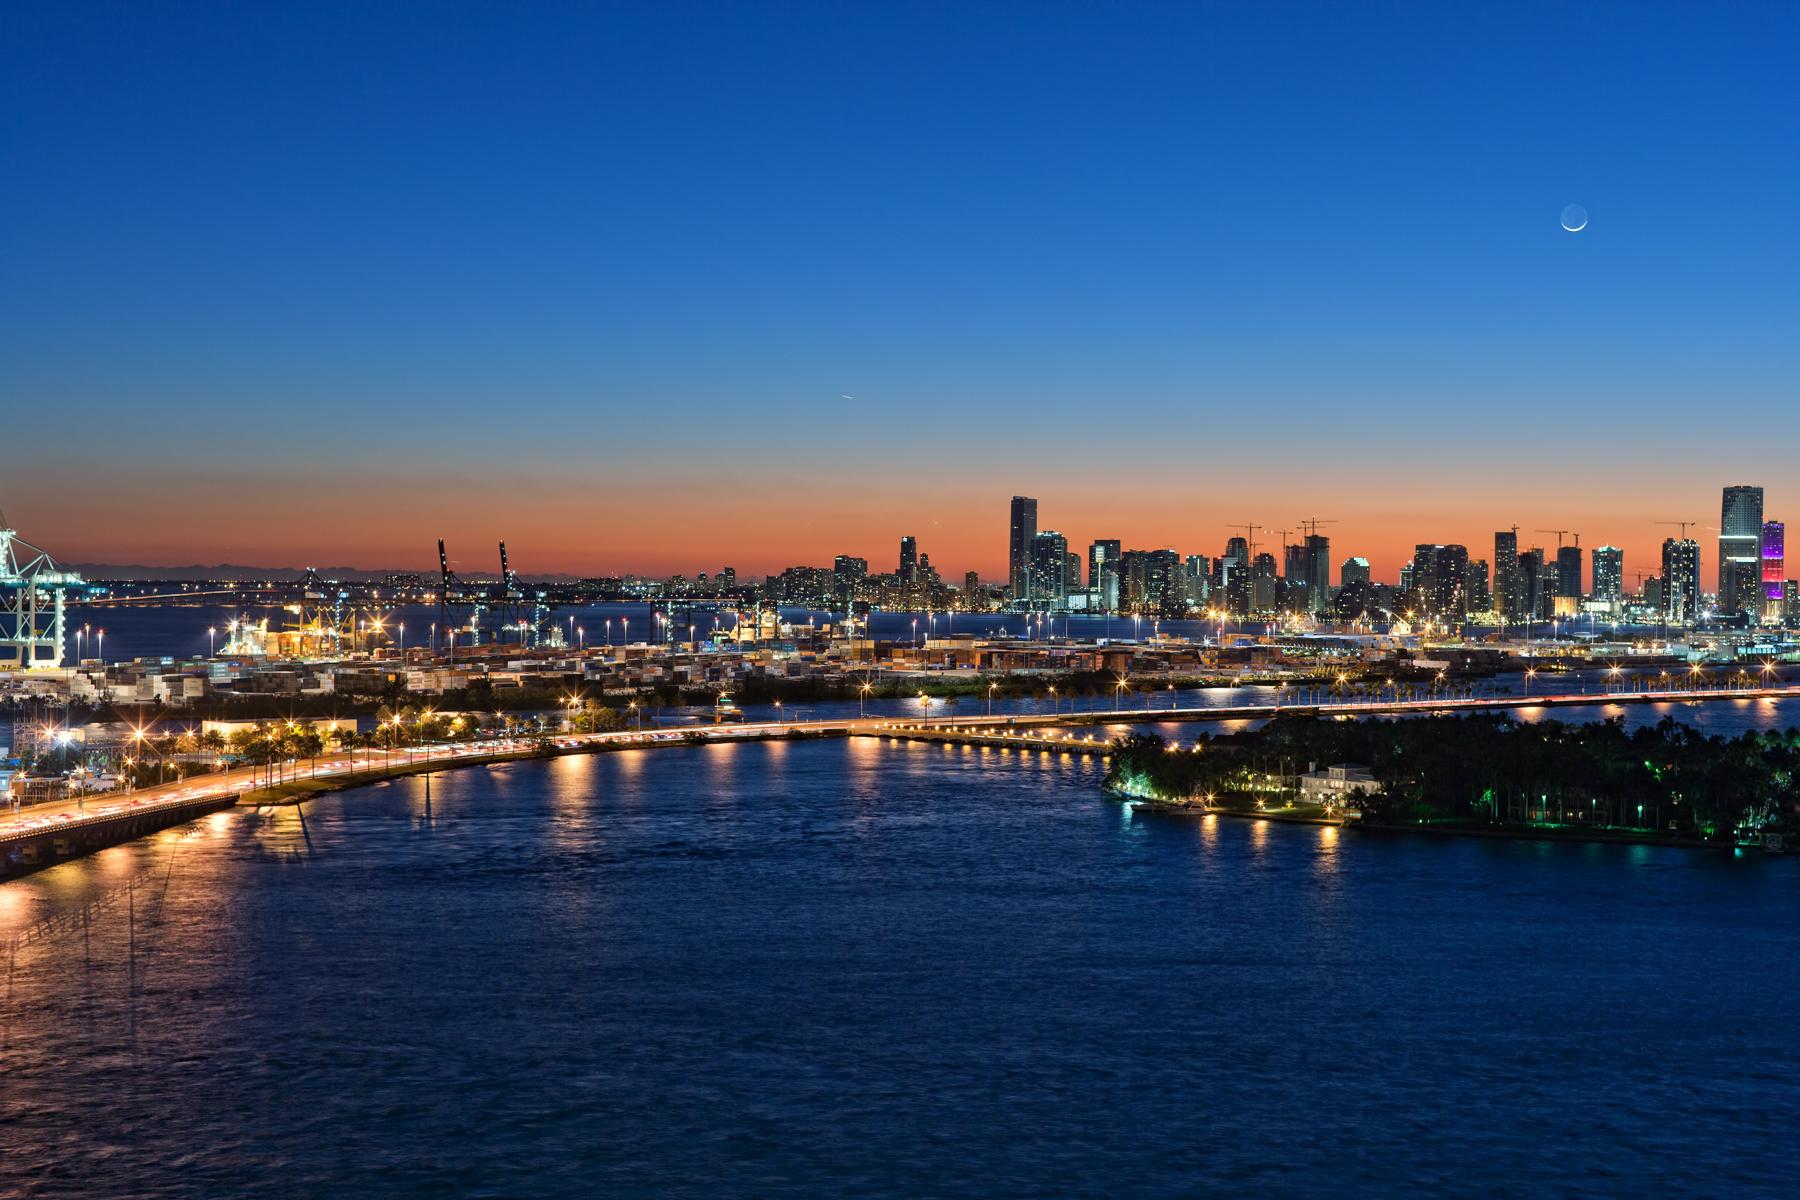 Sunset-0001-Edit.jpg